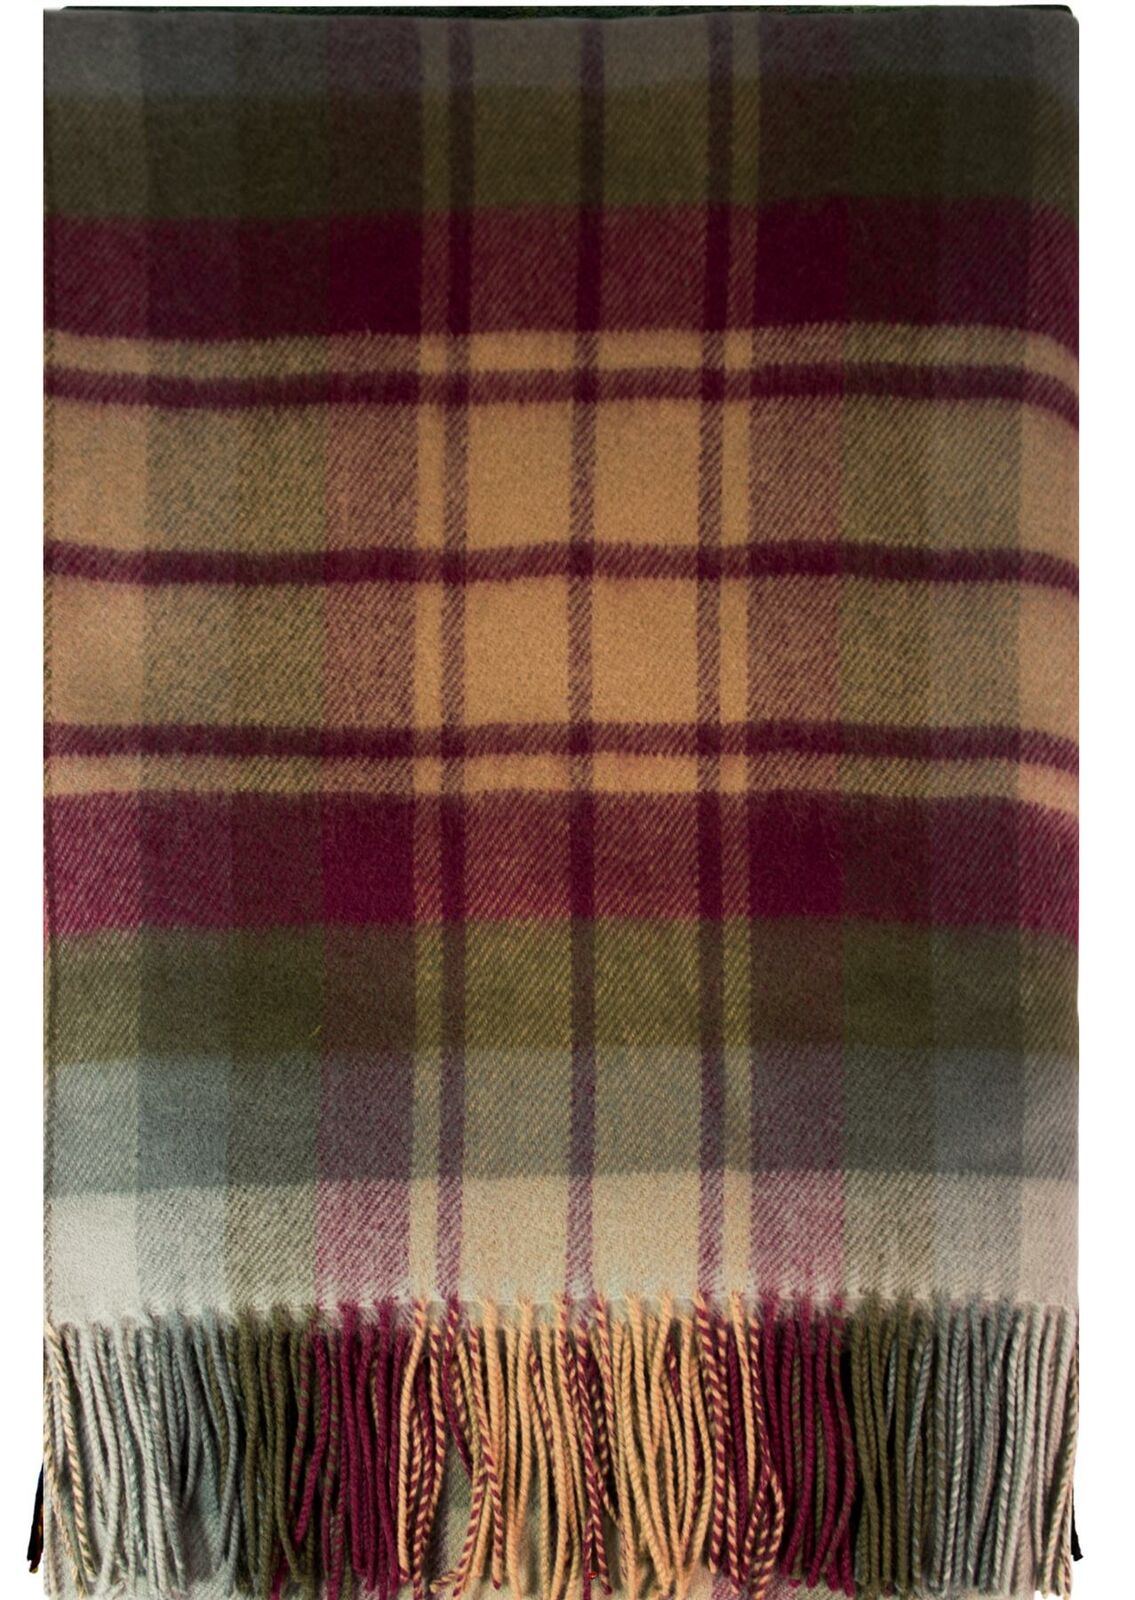 Auld Scozia Tartan Moderno Lusso LANA D'AGNELLO COPERTA 185cm x 140cm